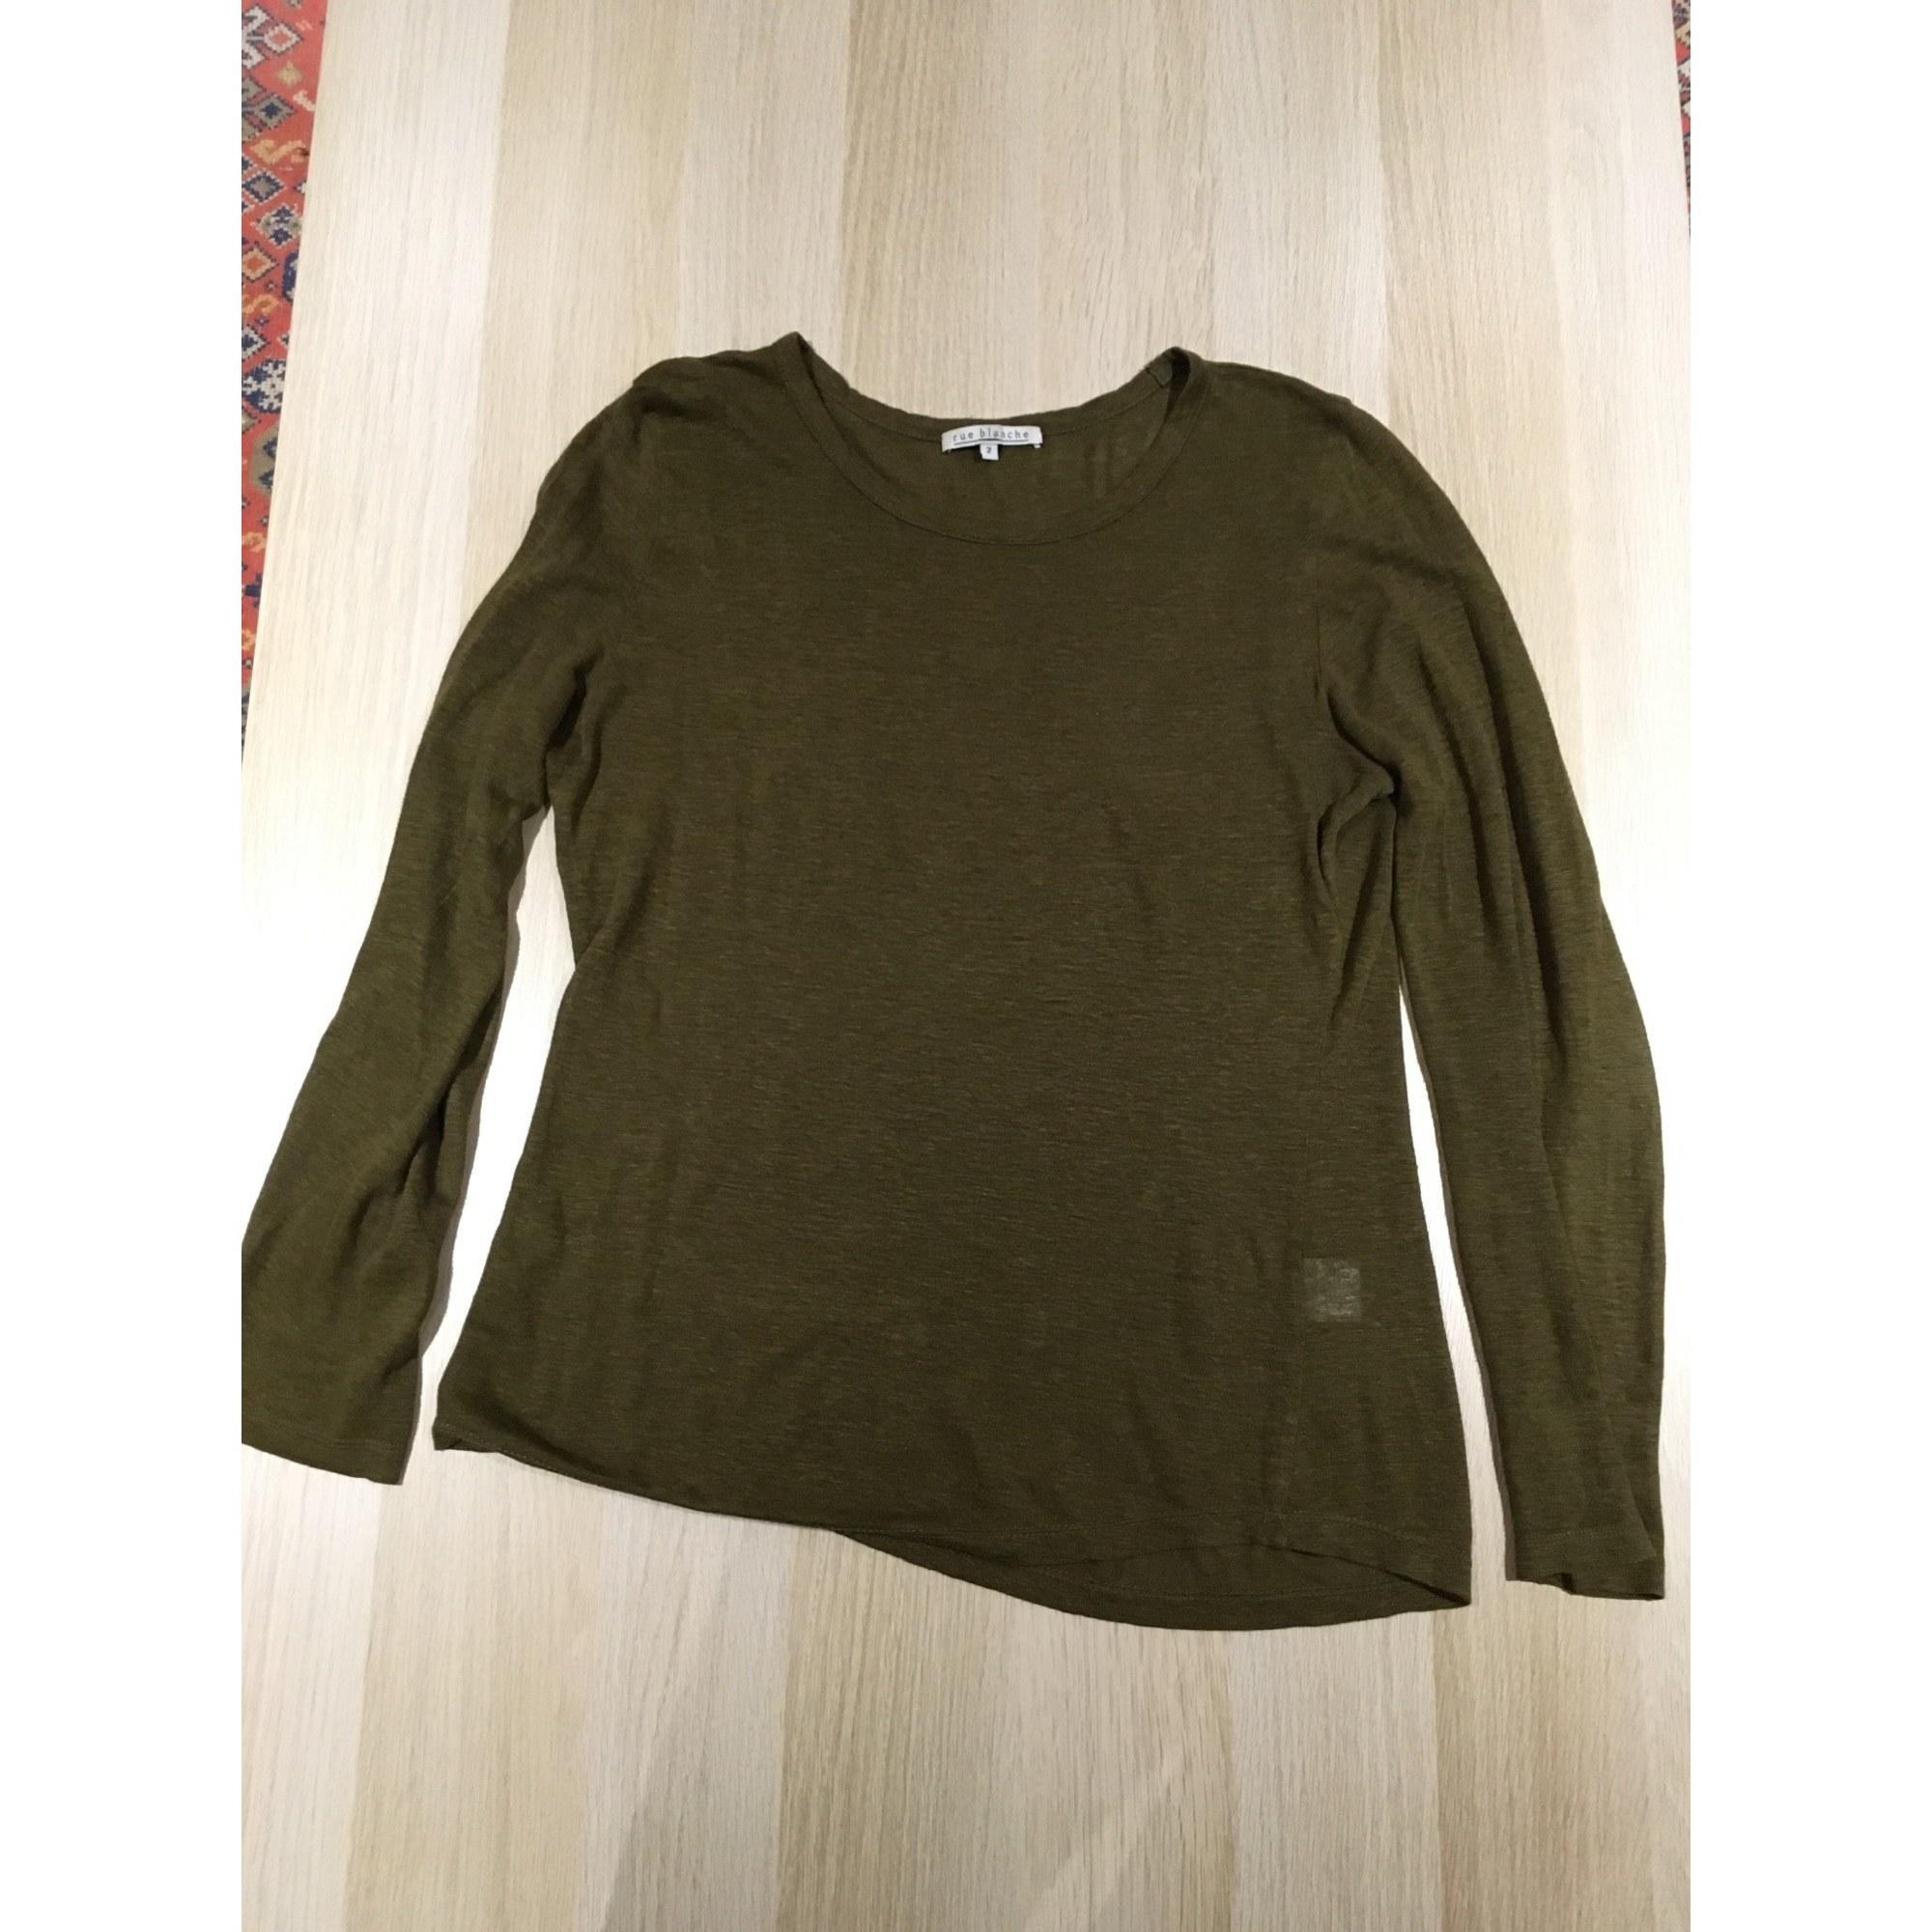 Top, tee-shirt RUE BLANCHE Kaki